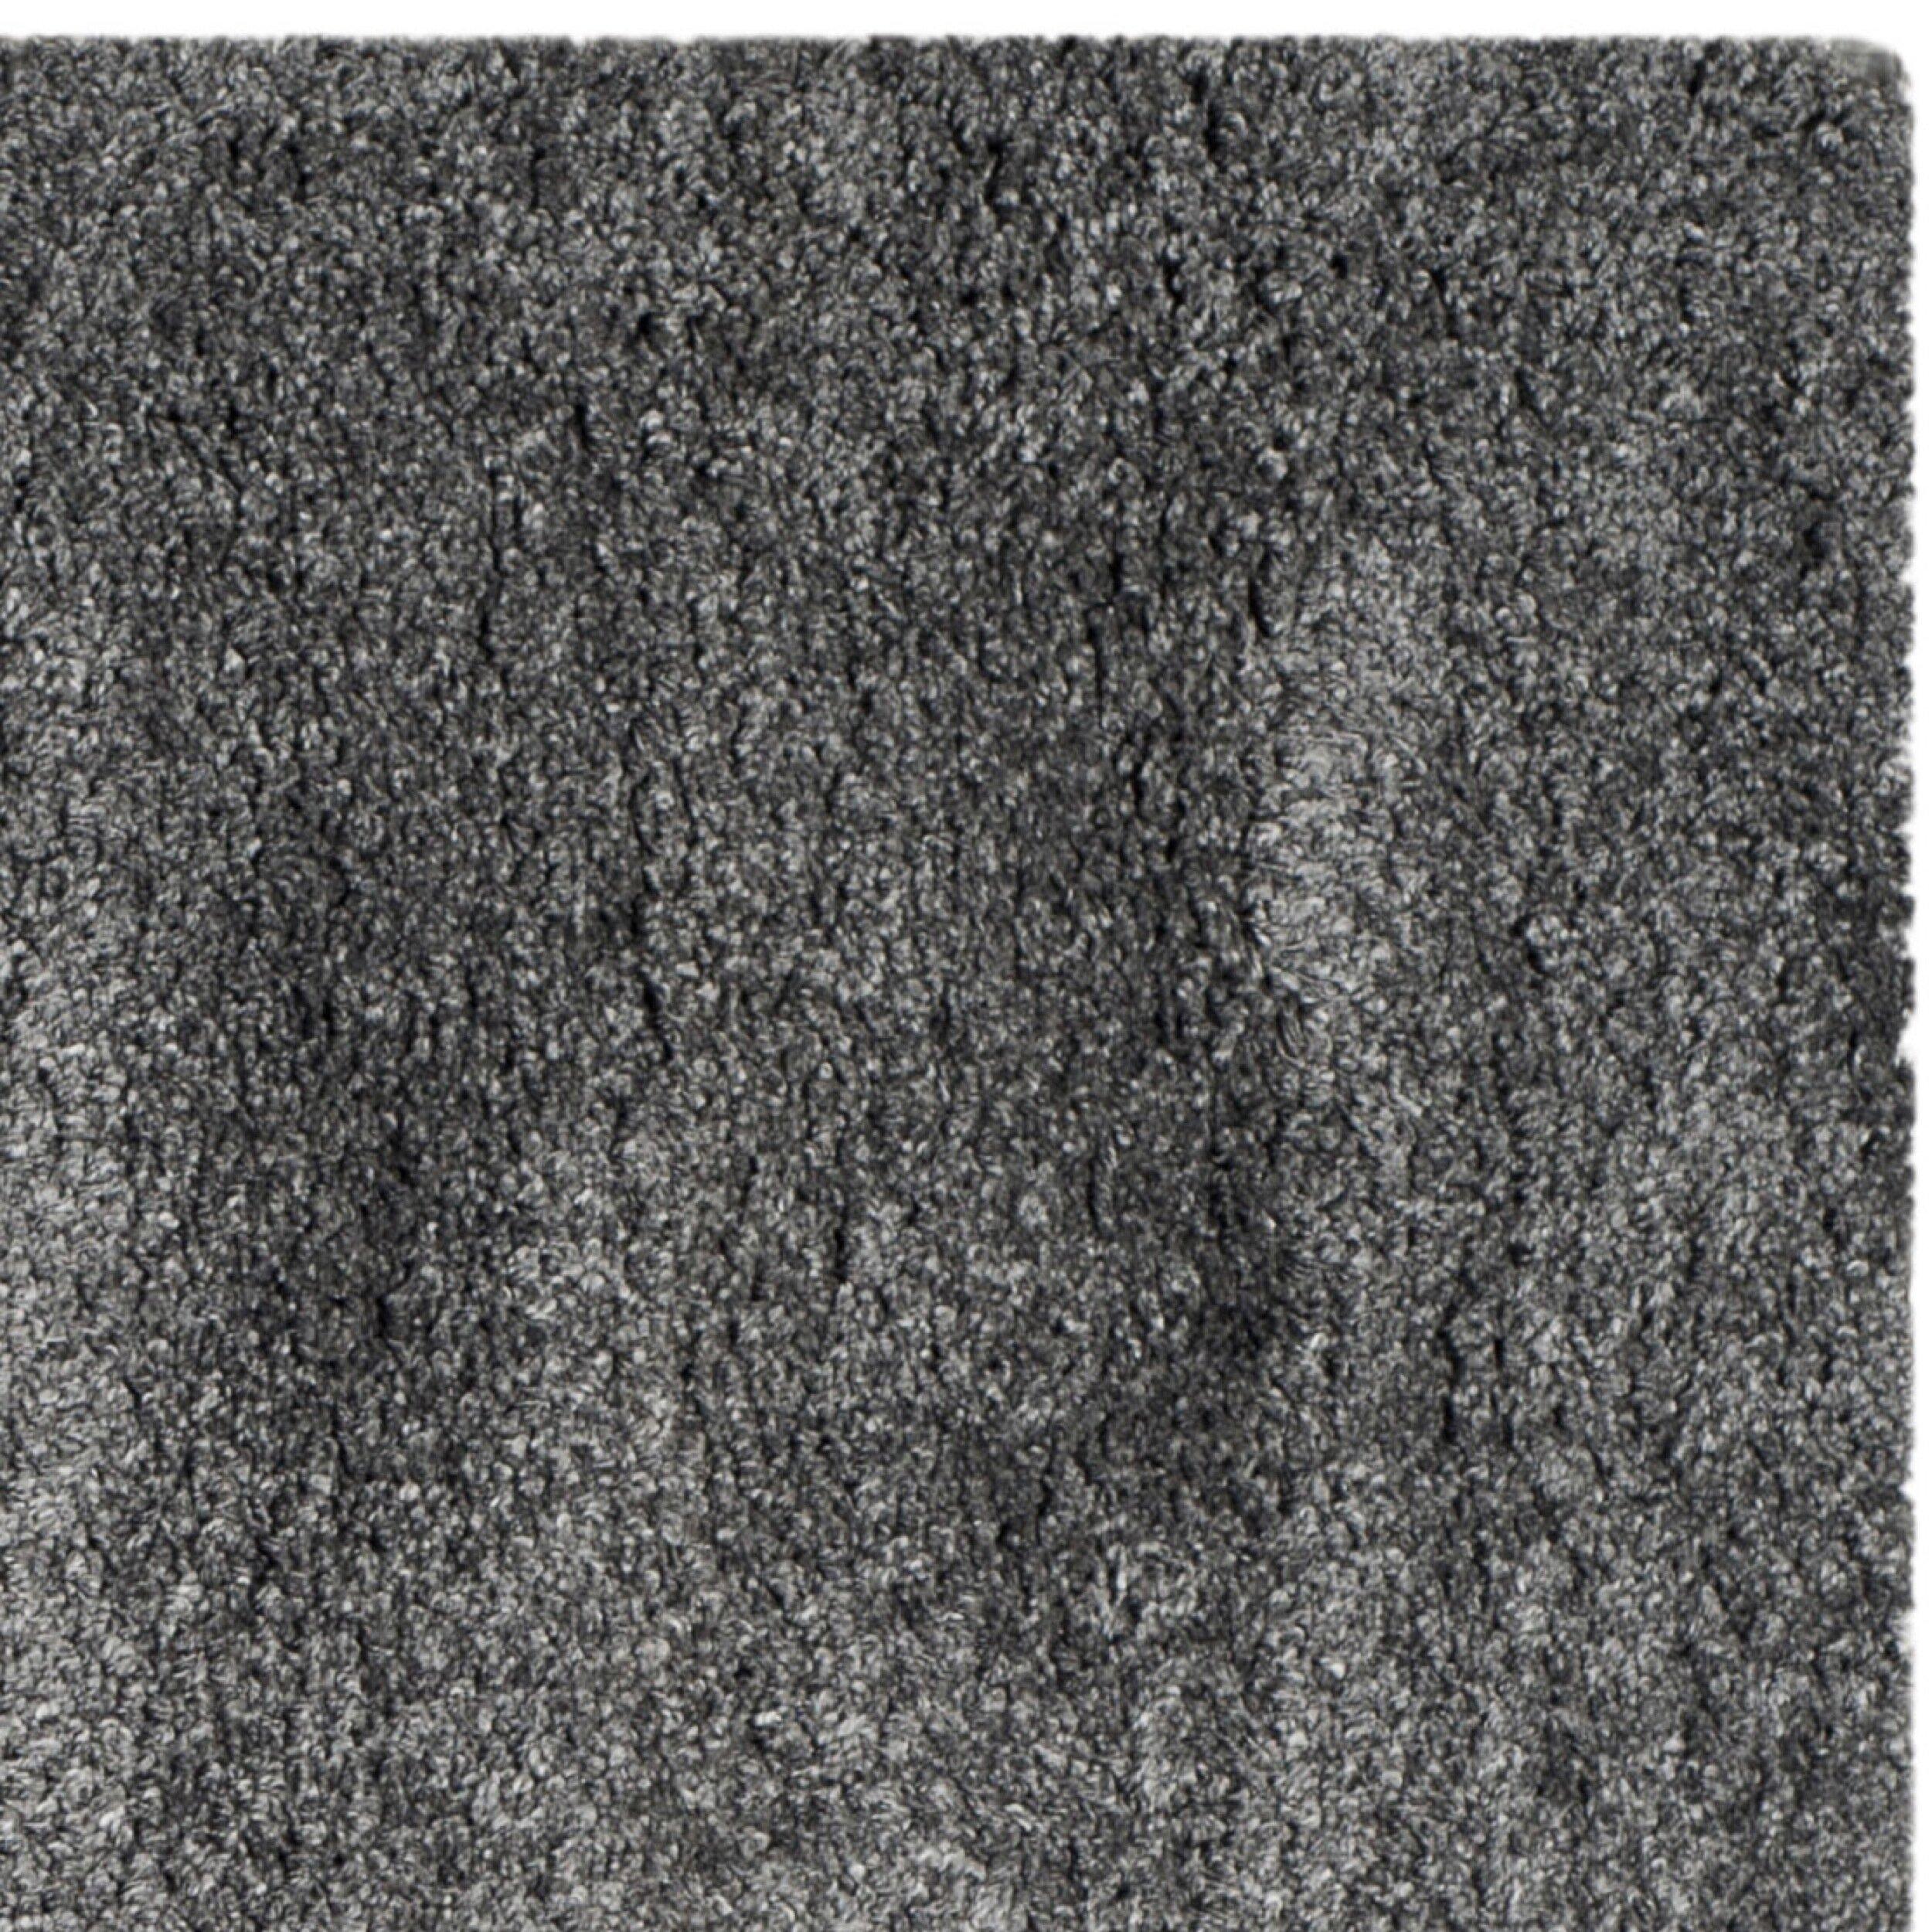 Safavieh Shag Handmade Dark Gray Area Rug & Reviews